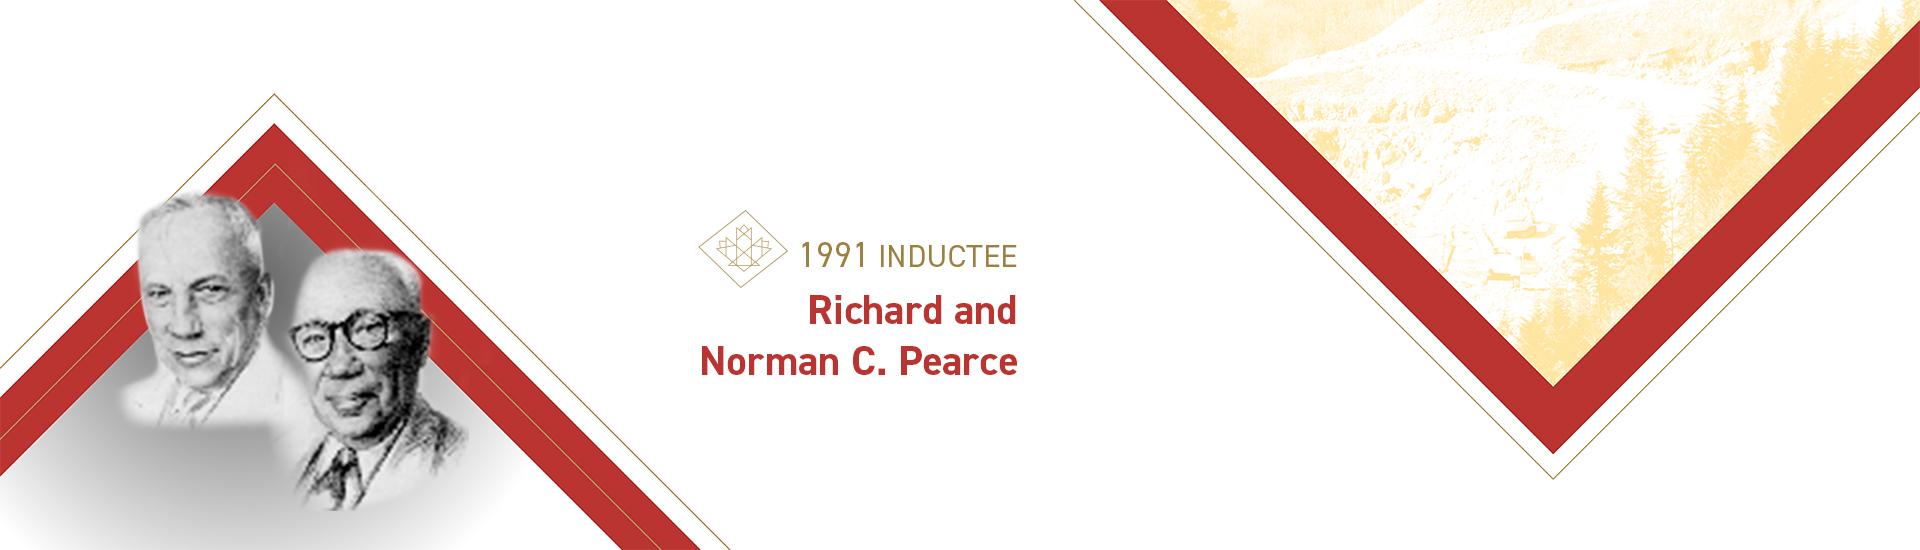 Richard and Norman C. Pearce